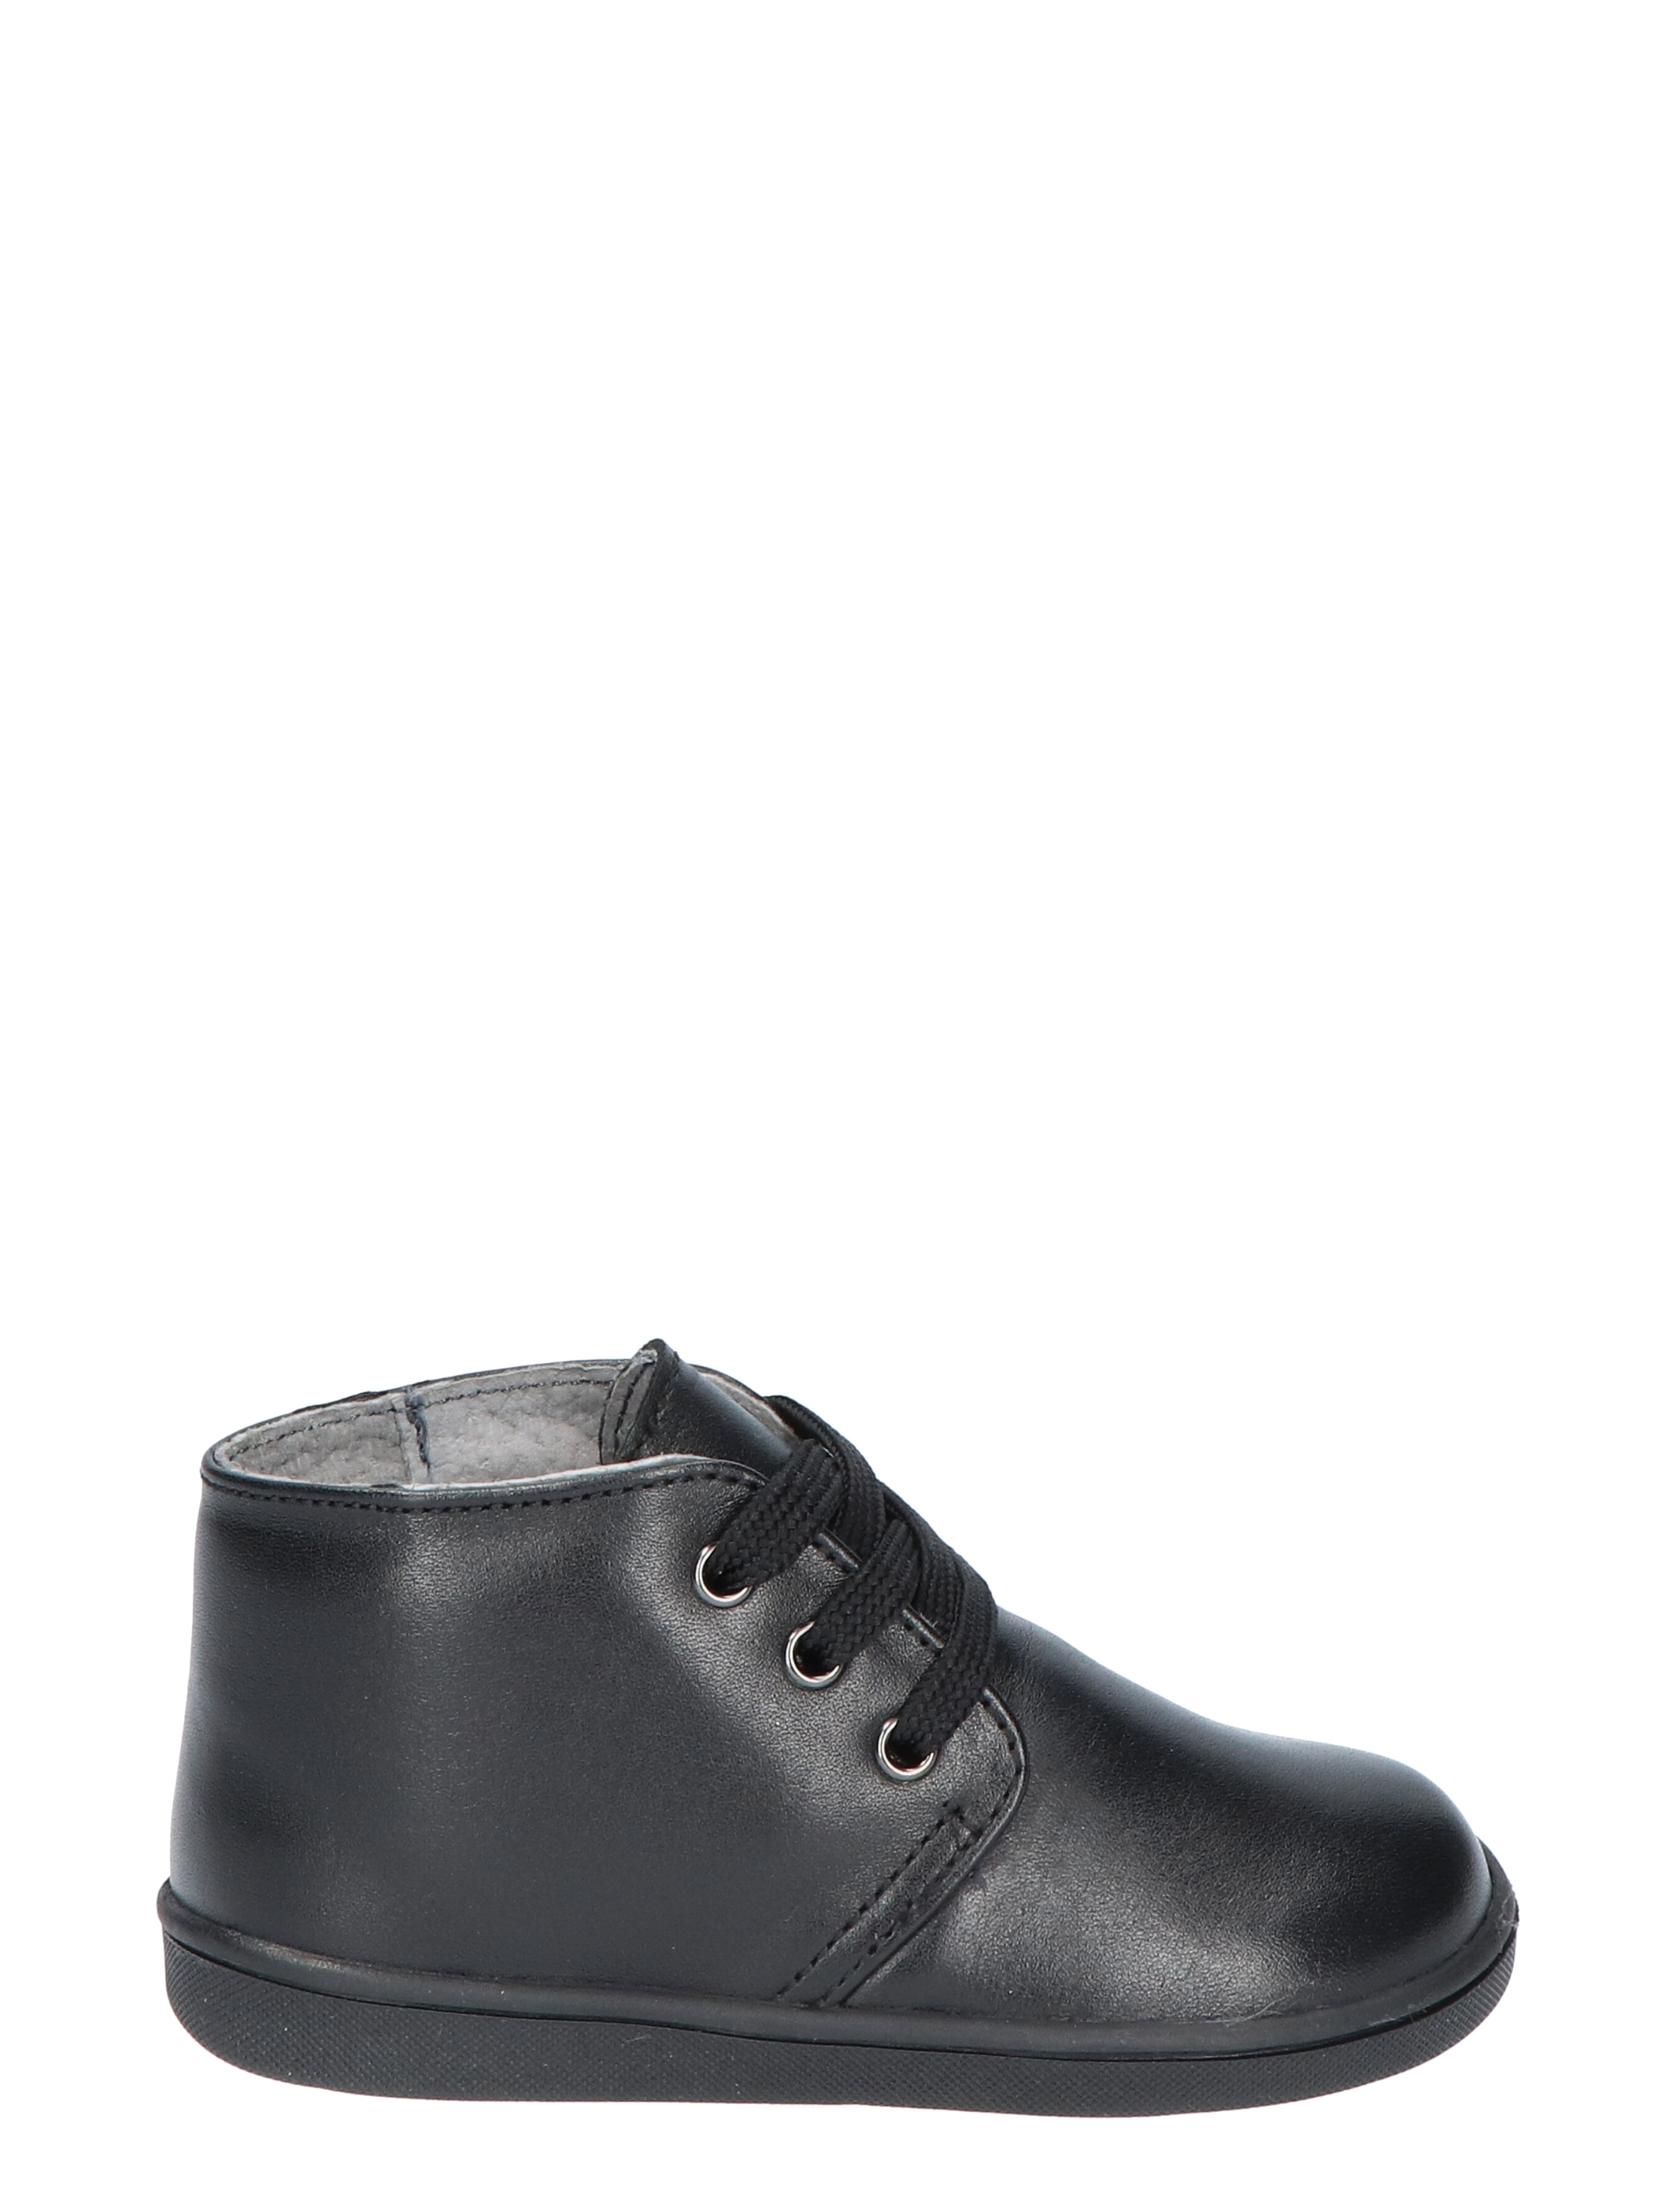 Pinocchio F1953 Black Veter boots